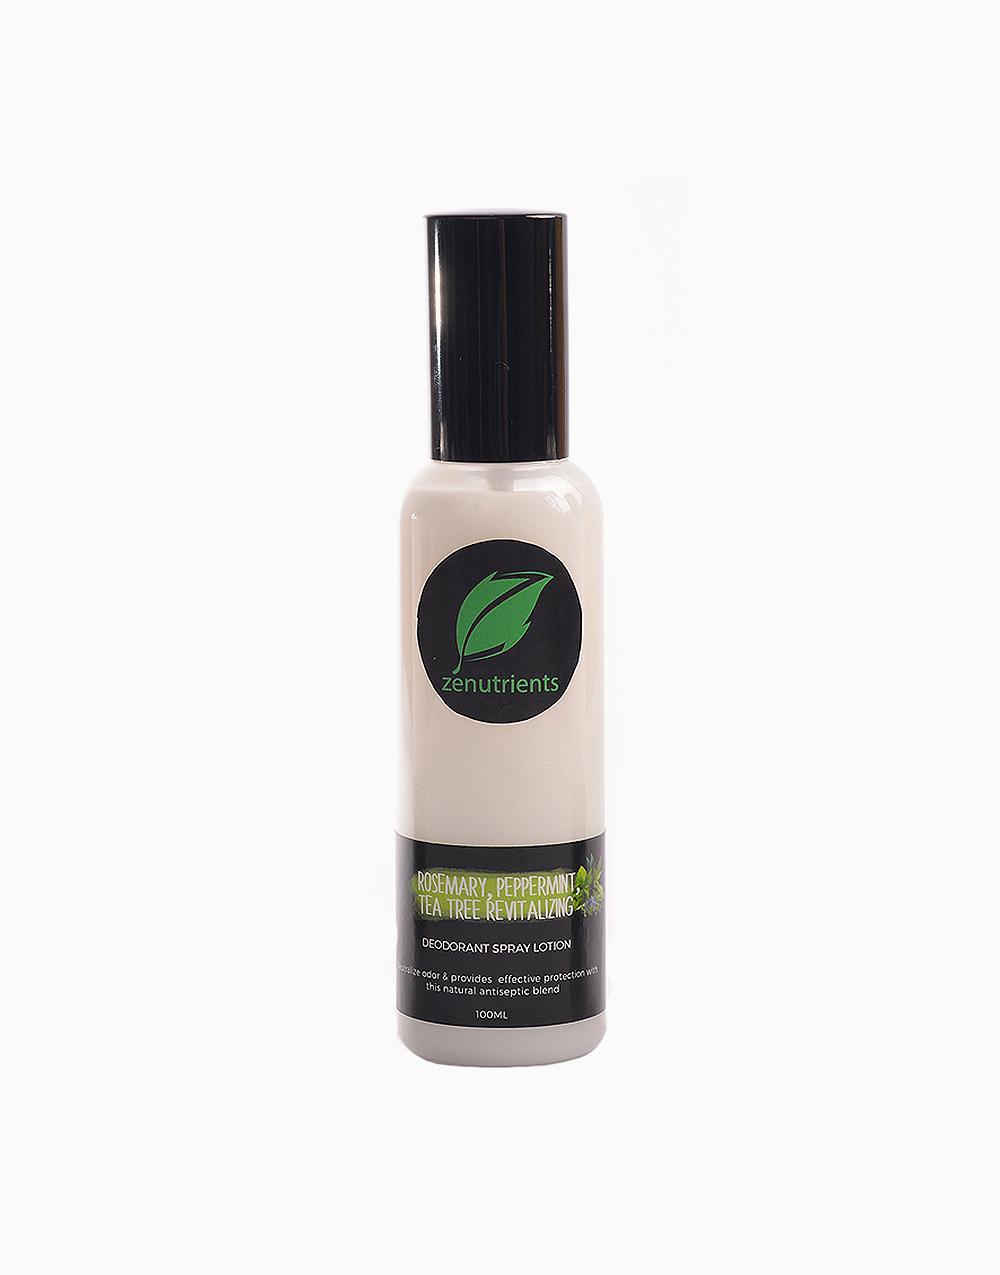 Revitalizing Rosemary, Peppermint, & Tea Tree Deodorant Spray Lotion (100ml) by Zenutrients